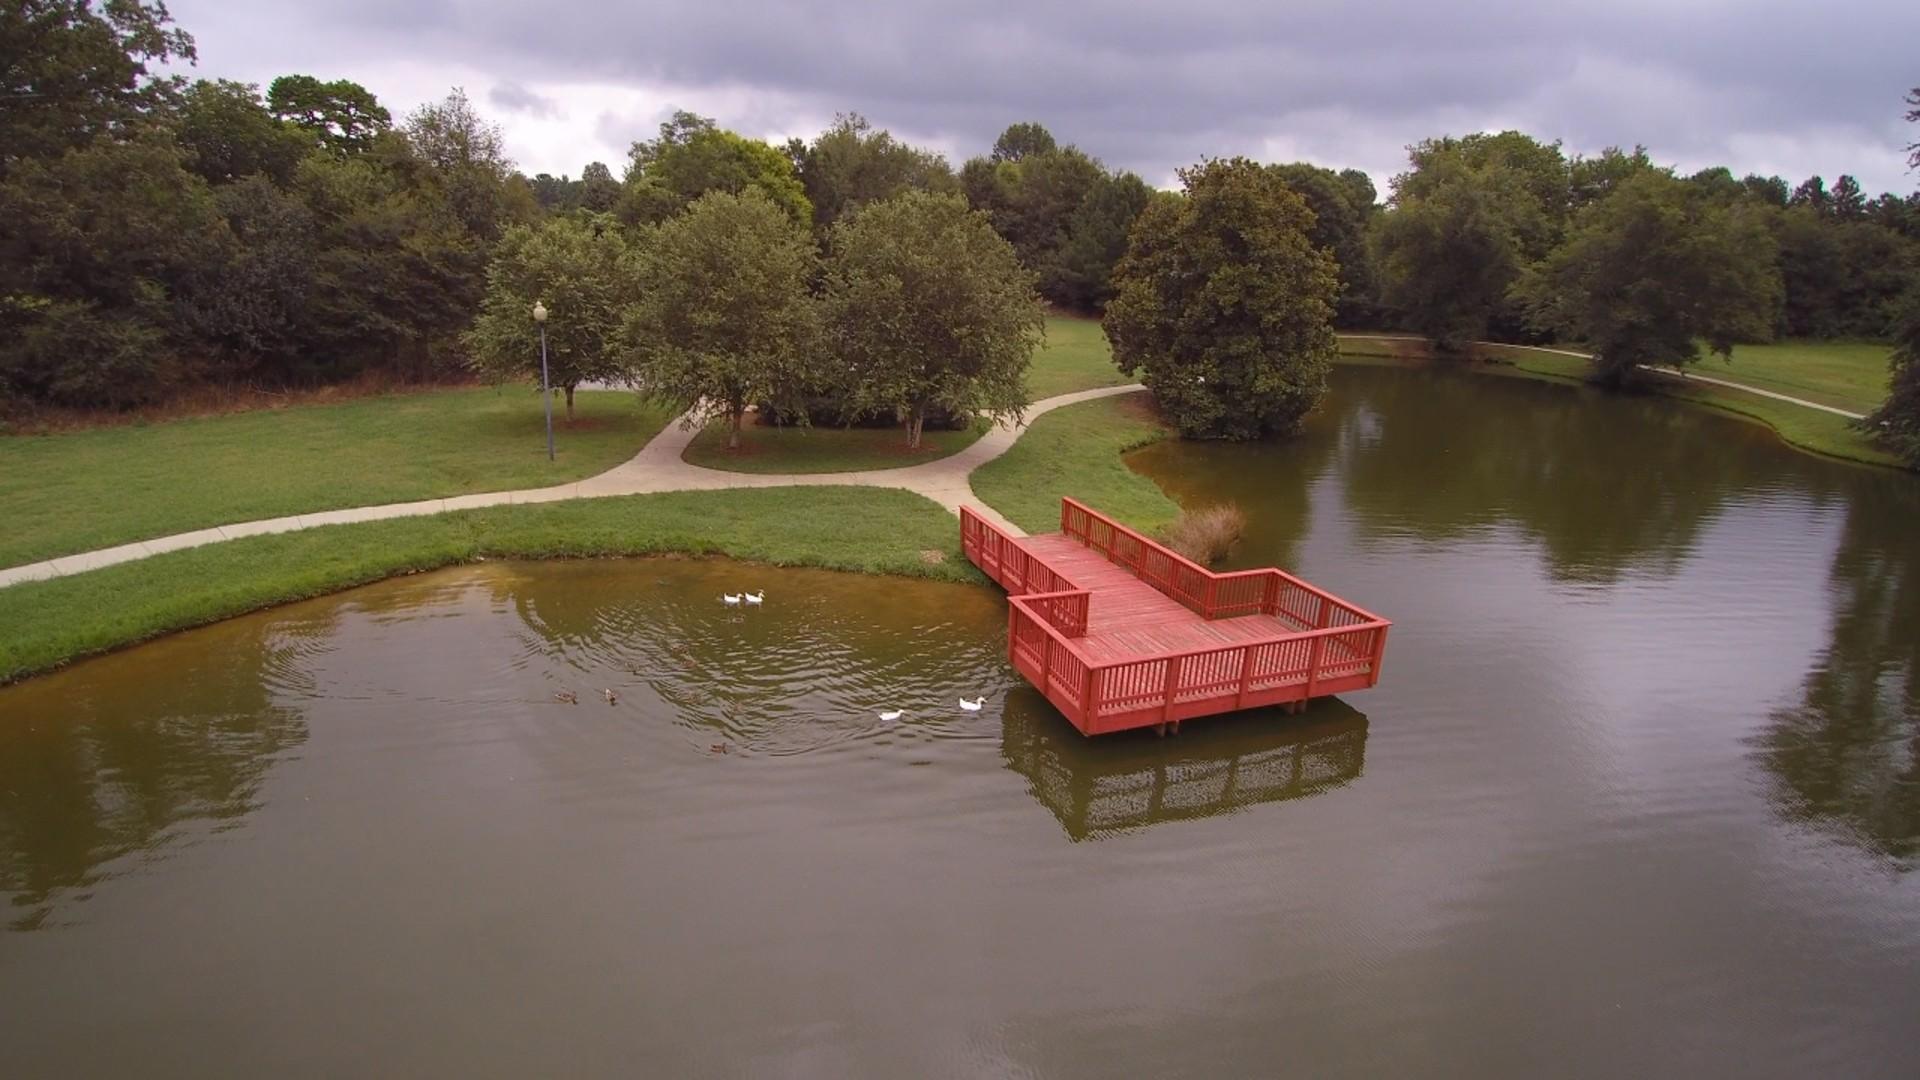 Drone_Lake_Dock_Traditio00120171106081506